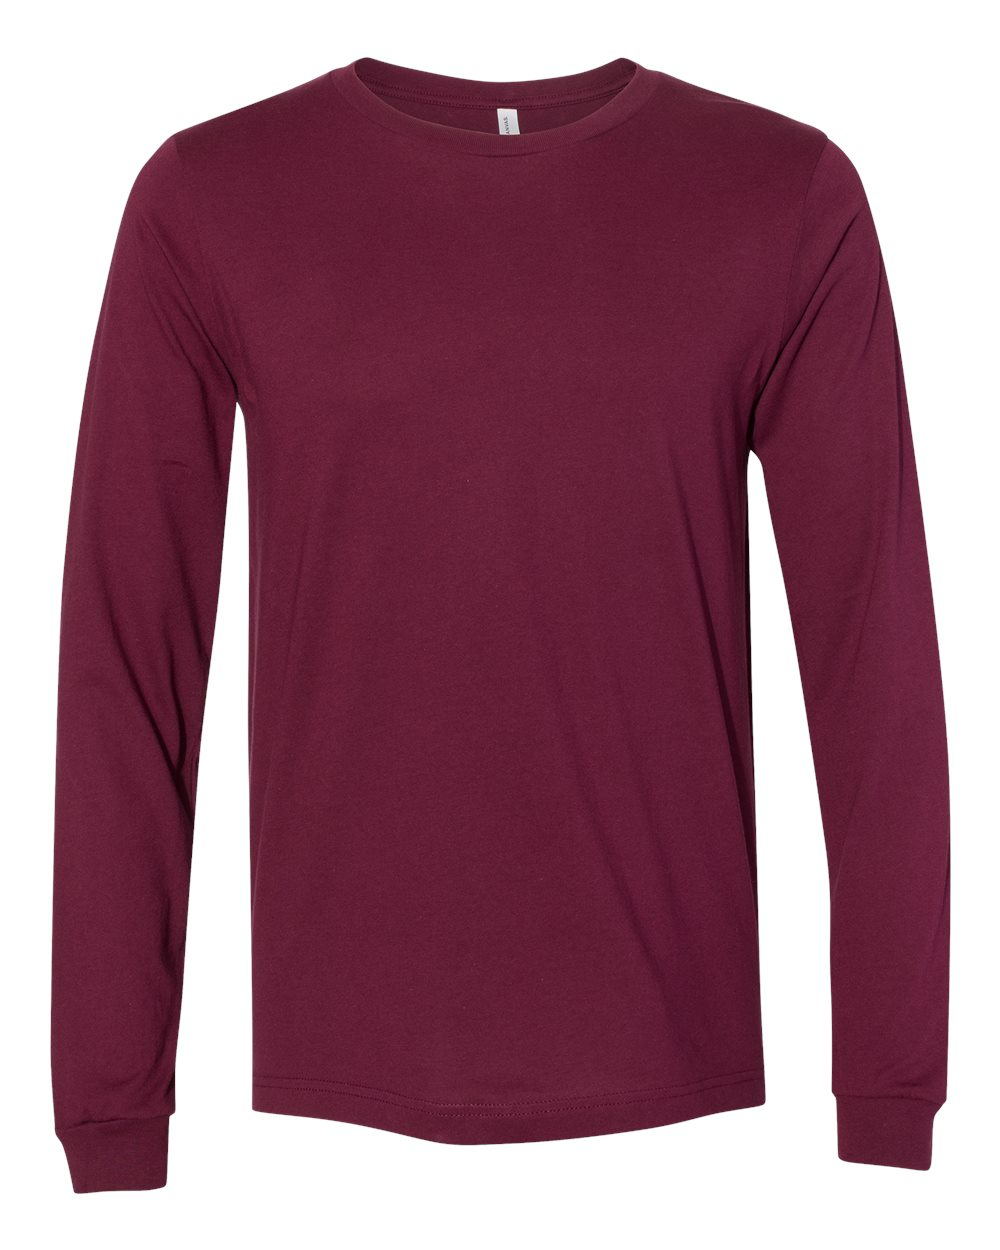 Bella-Canvas-Mens-Blank-Top-Long-Sleeve-Jersey-Tee-T-Shirt-3501-up-to-3XL thumbnail 76